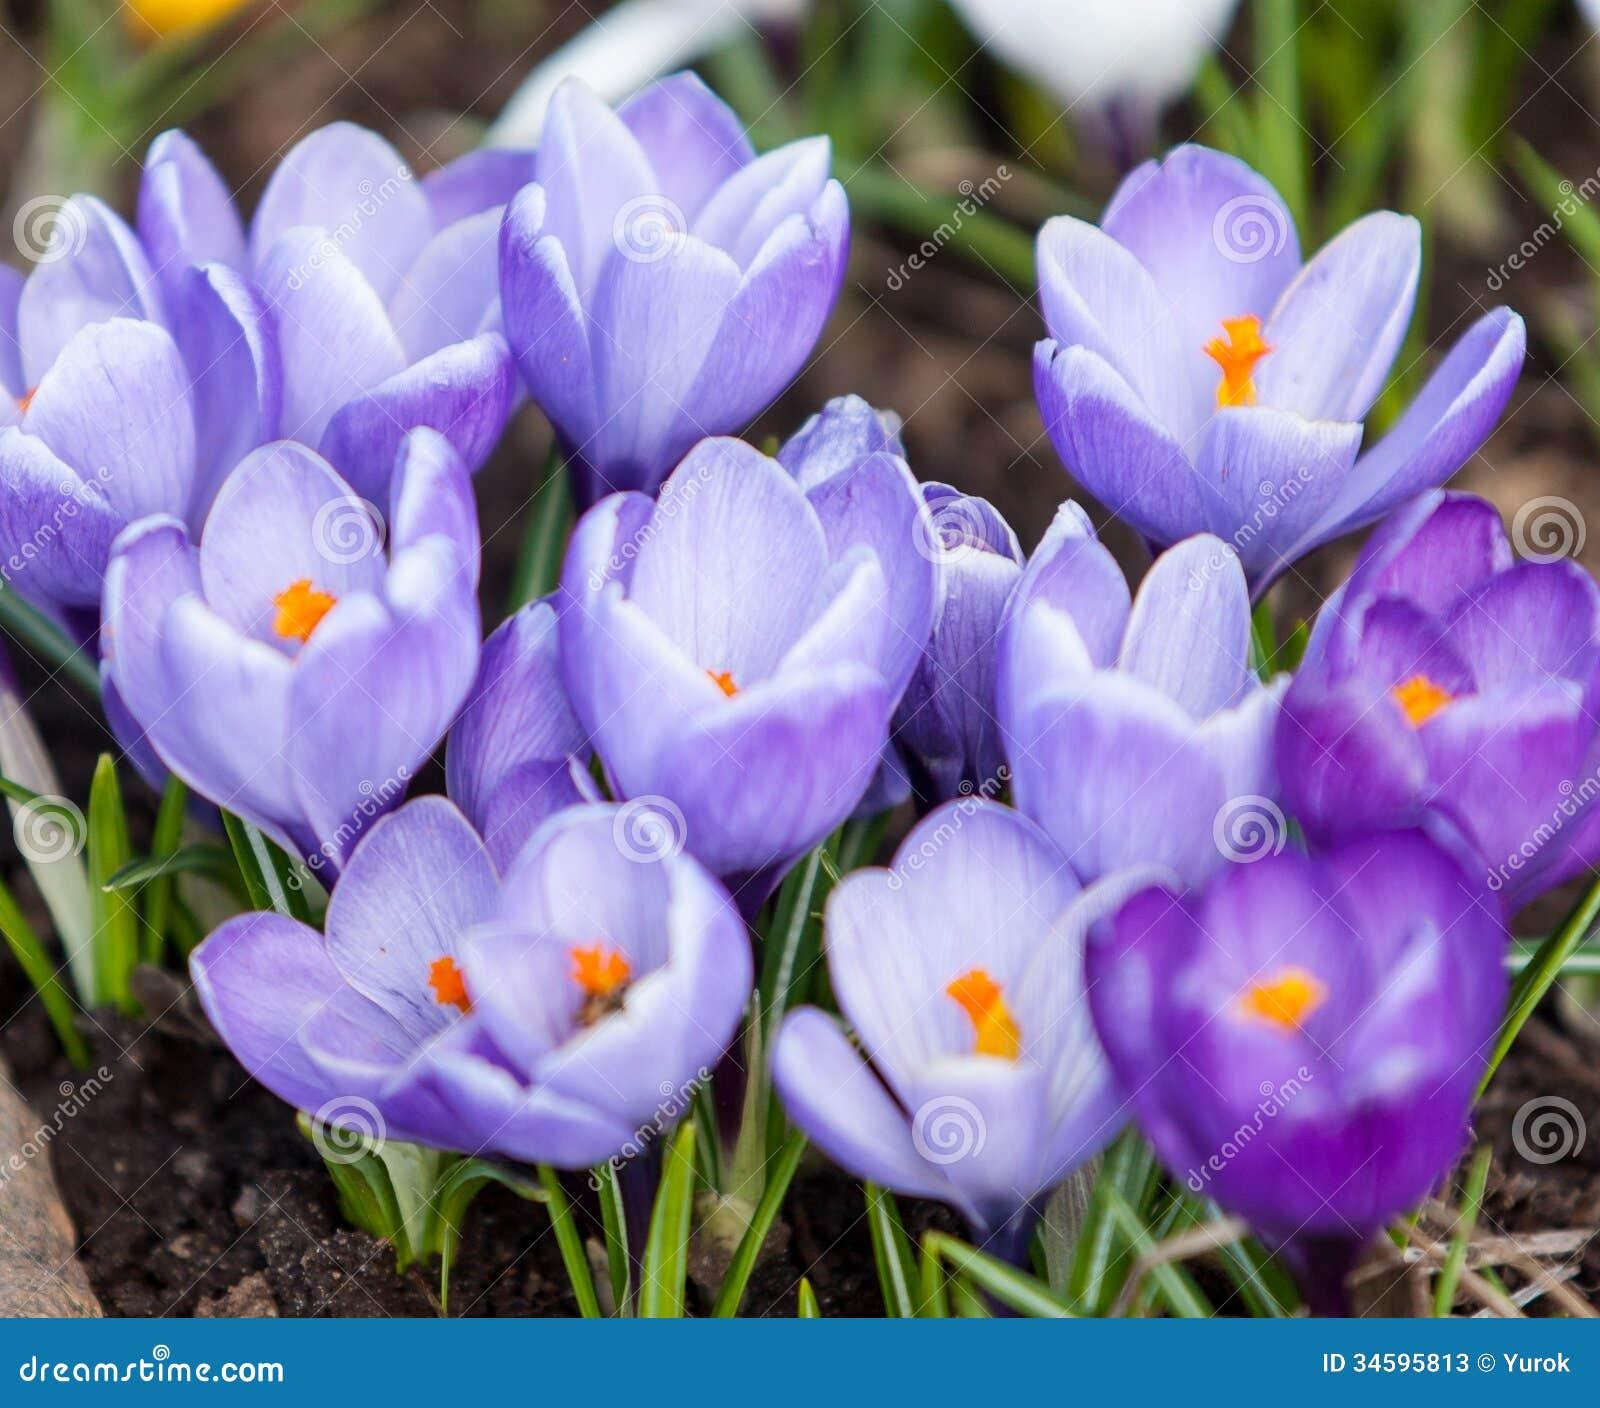 Crocus spring flowers stock photos image 34595813 blooming close crocus spring dhlflorist Choice Image